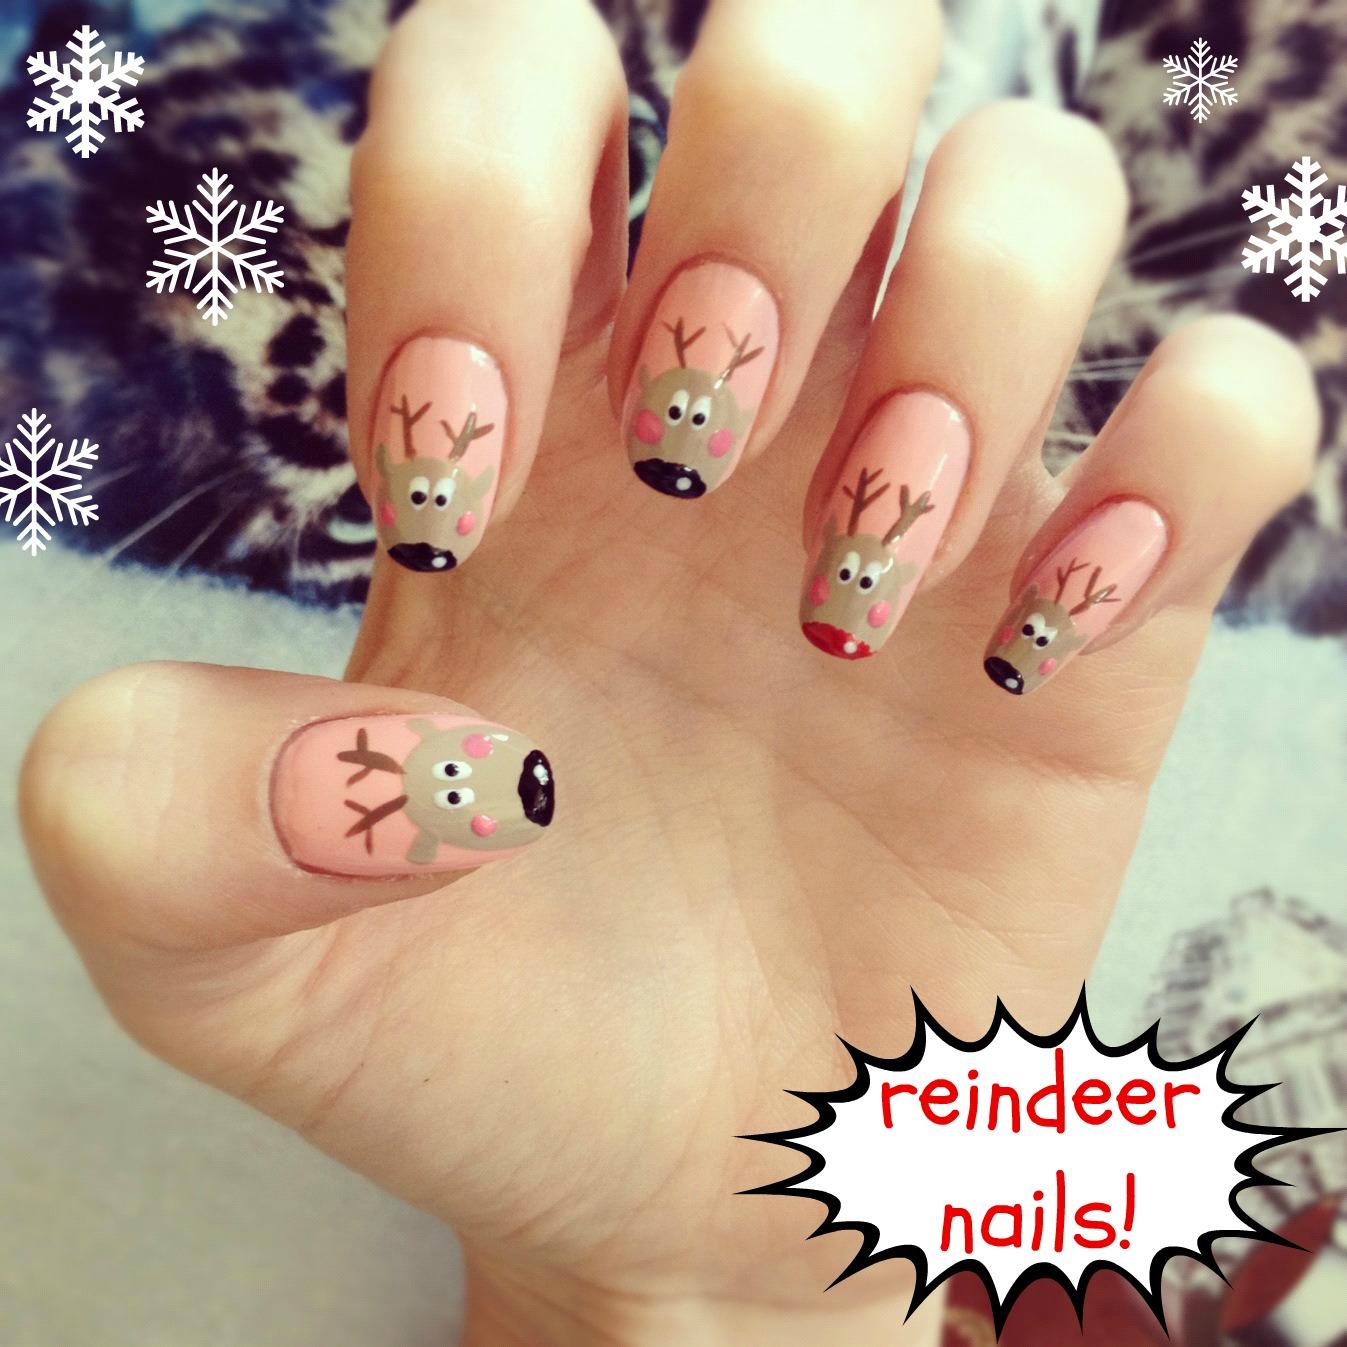 Christmas nails rudolph nail art burkatron christmas nails rudolph nail art prinsesfo Images